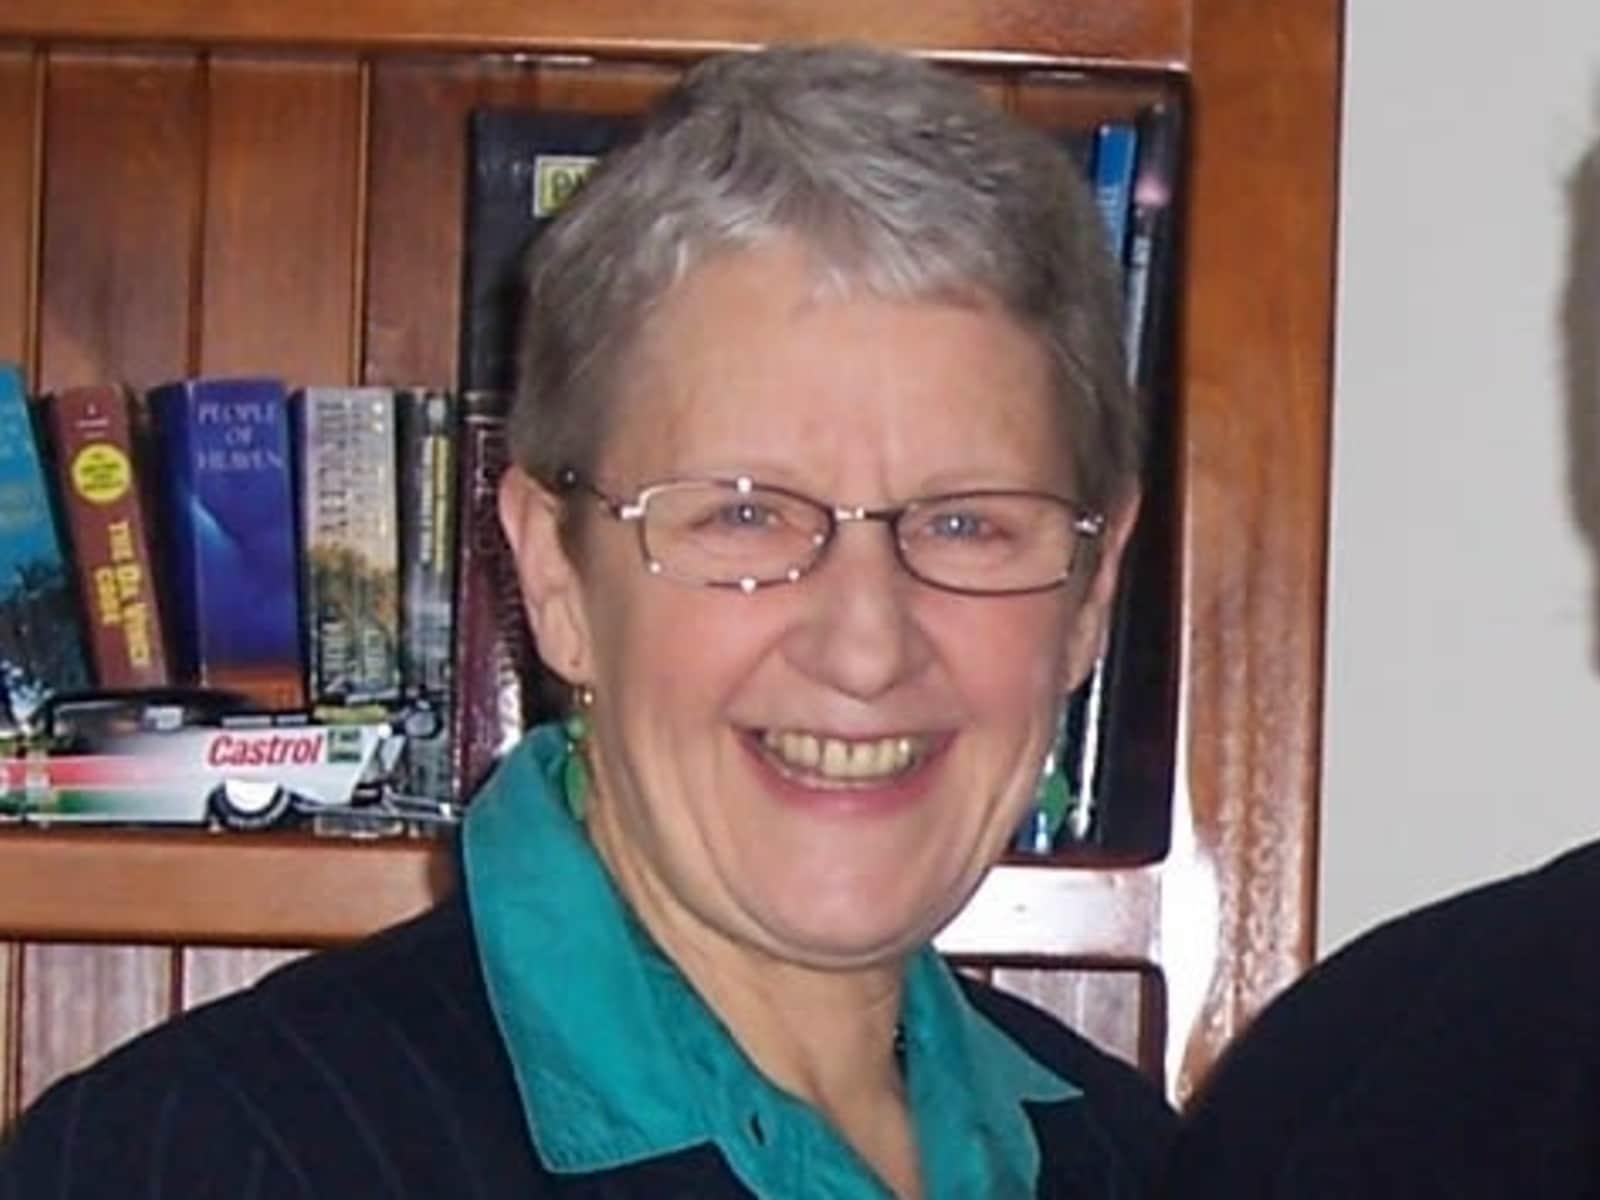 Fran from Perth, Western Australia, Australia